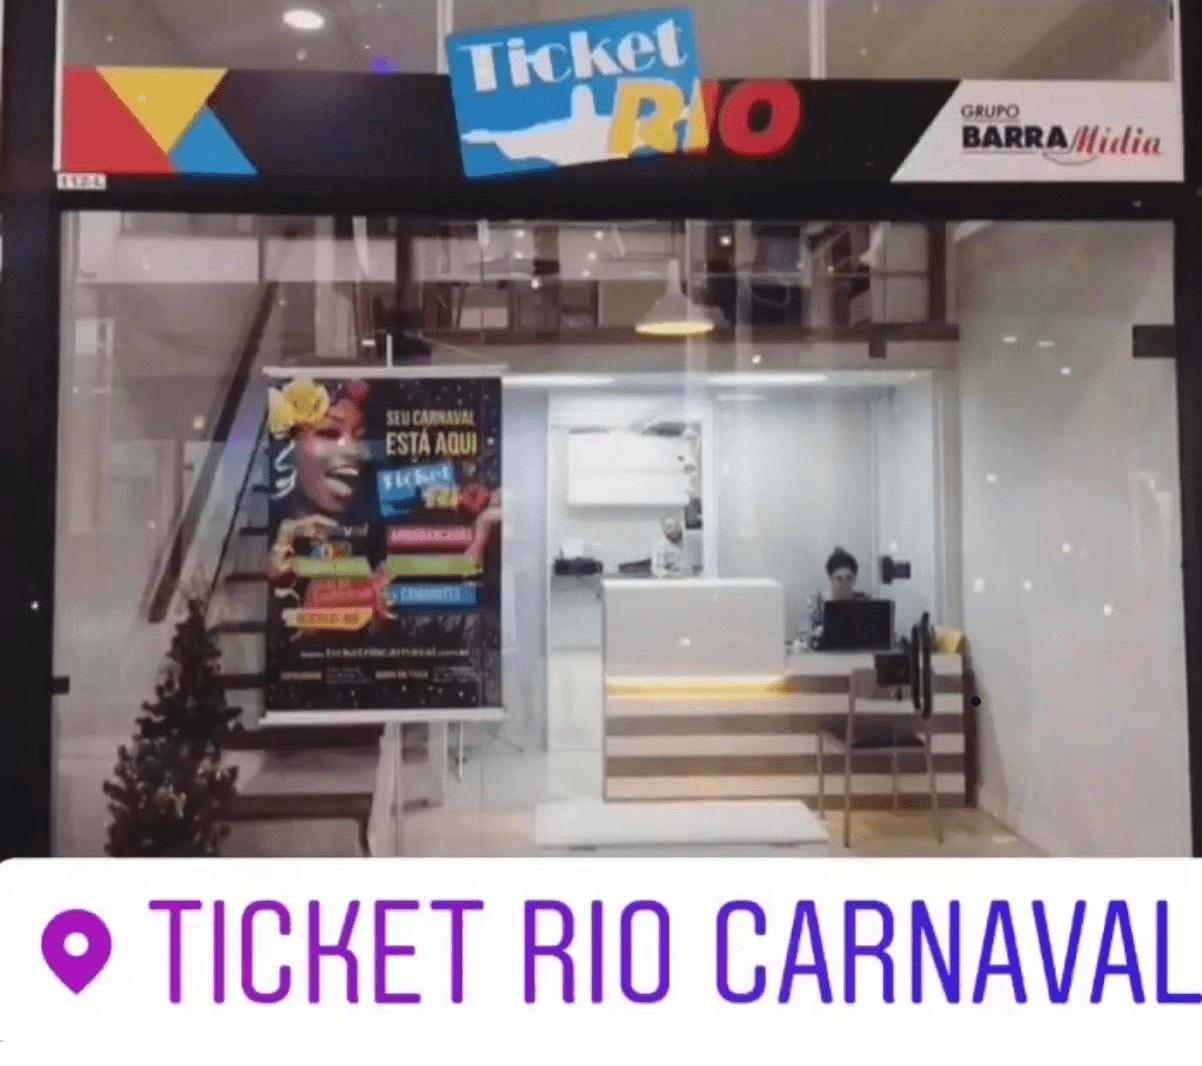 Loja Física Ticket Rio